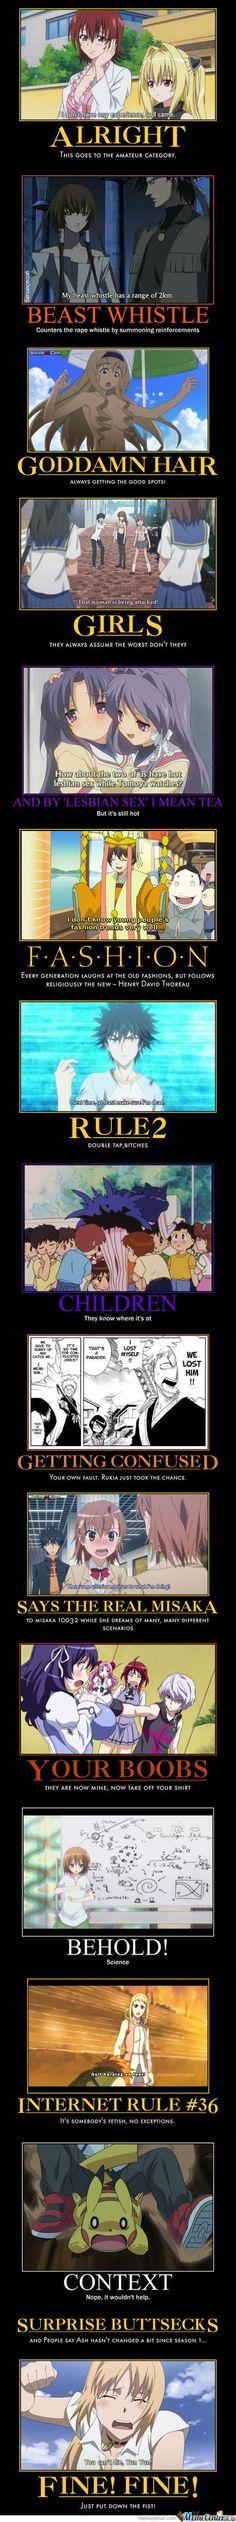 Anime demotivational posters compilation